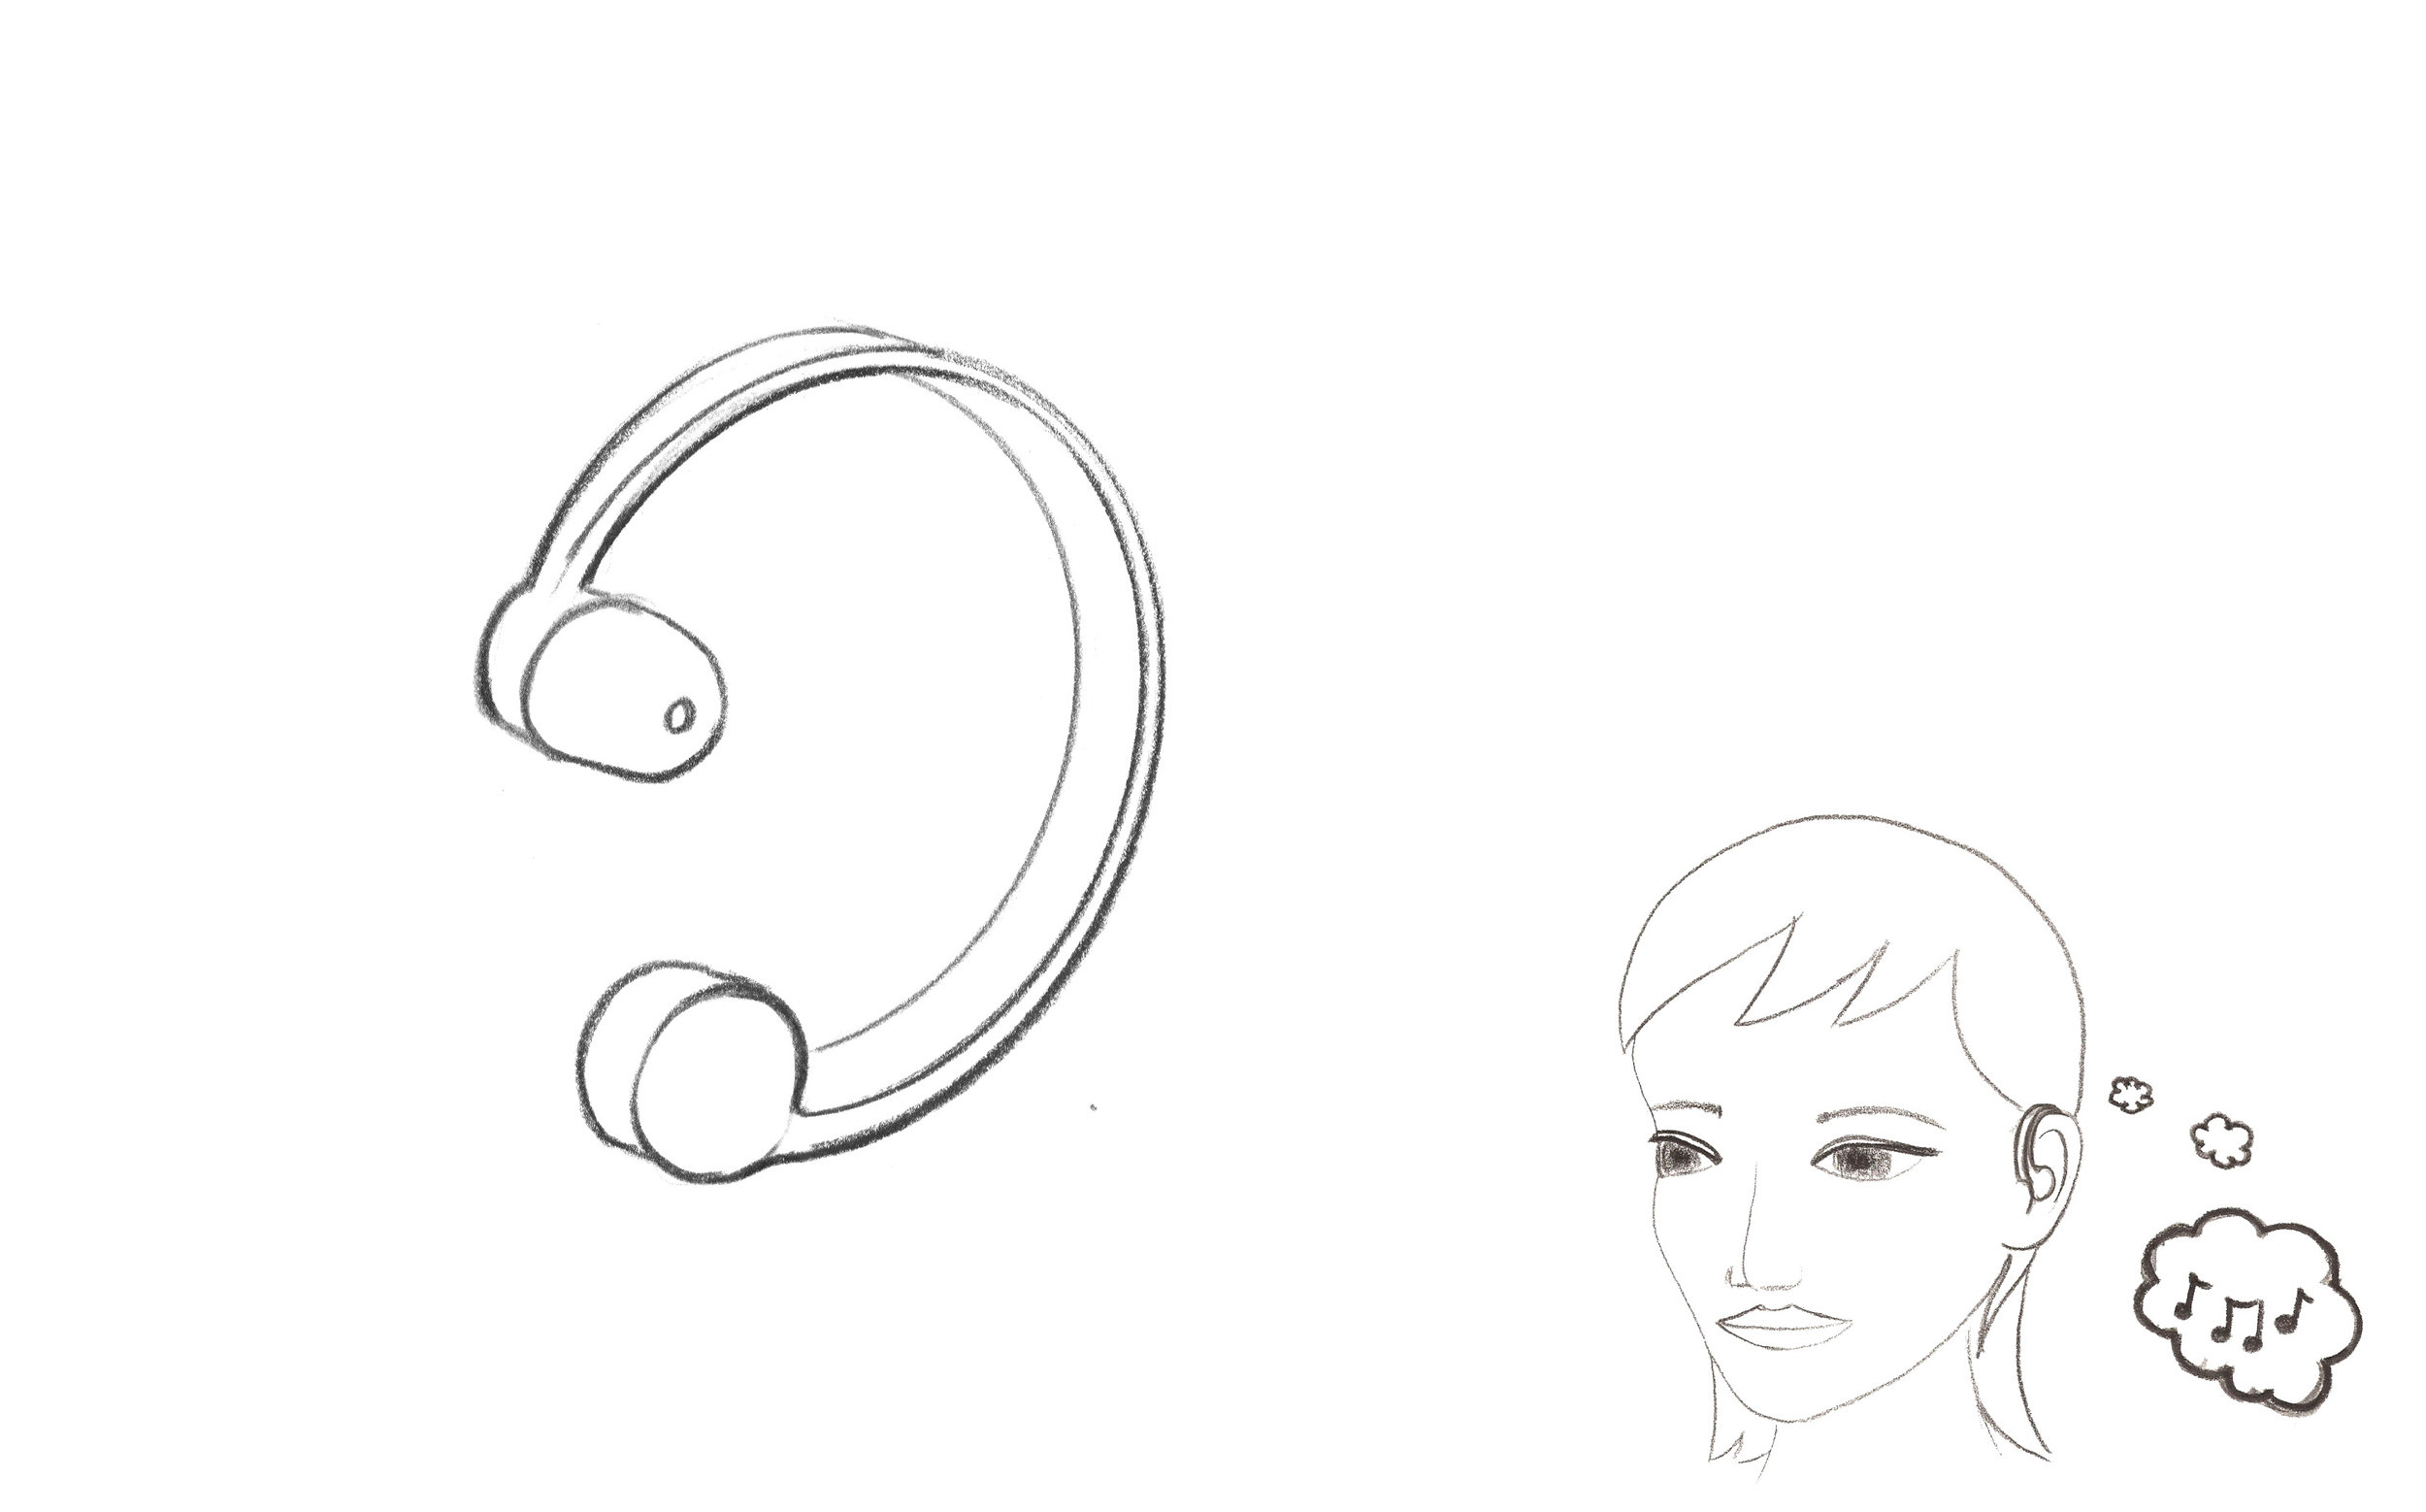 Augmented Sound Concept: Bone Induction Secondary Sounds